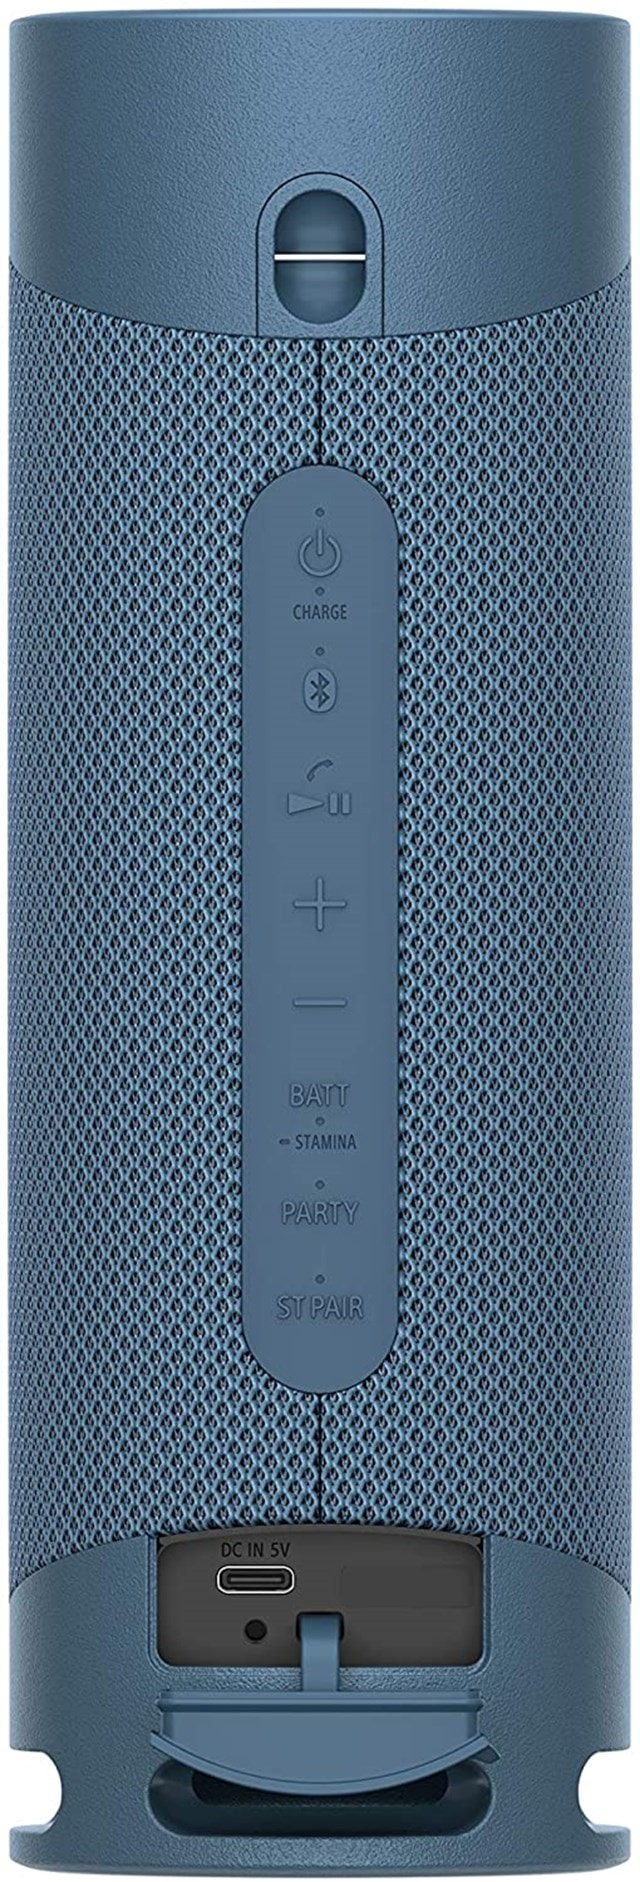 Sony SRSXB23 Blue Bluetooth Speaker - 3